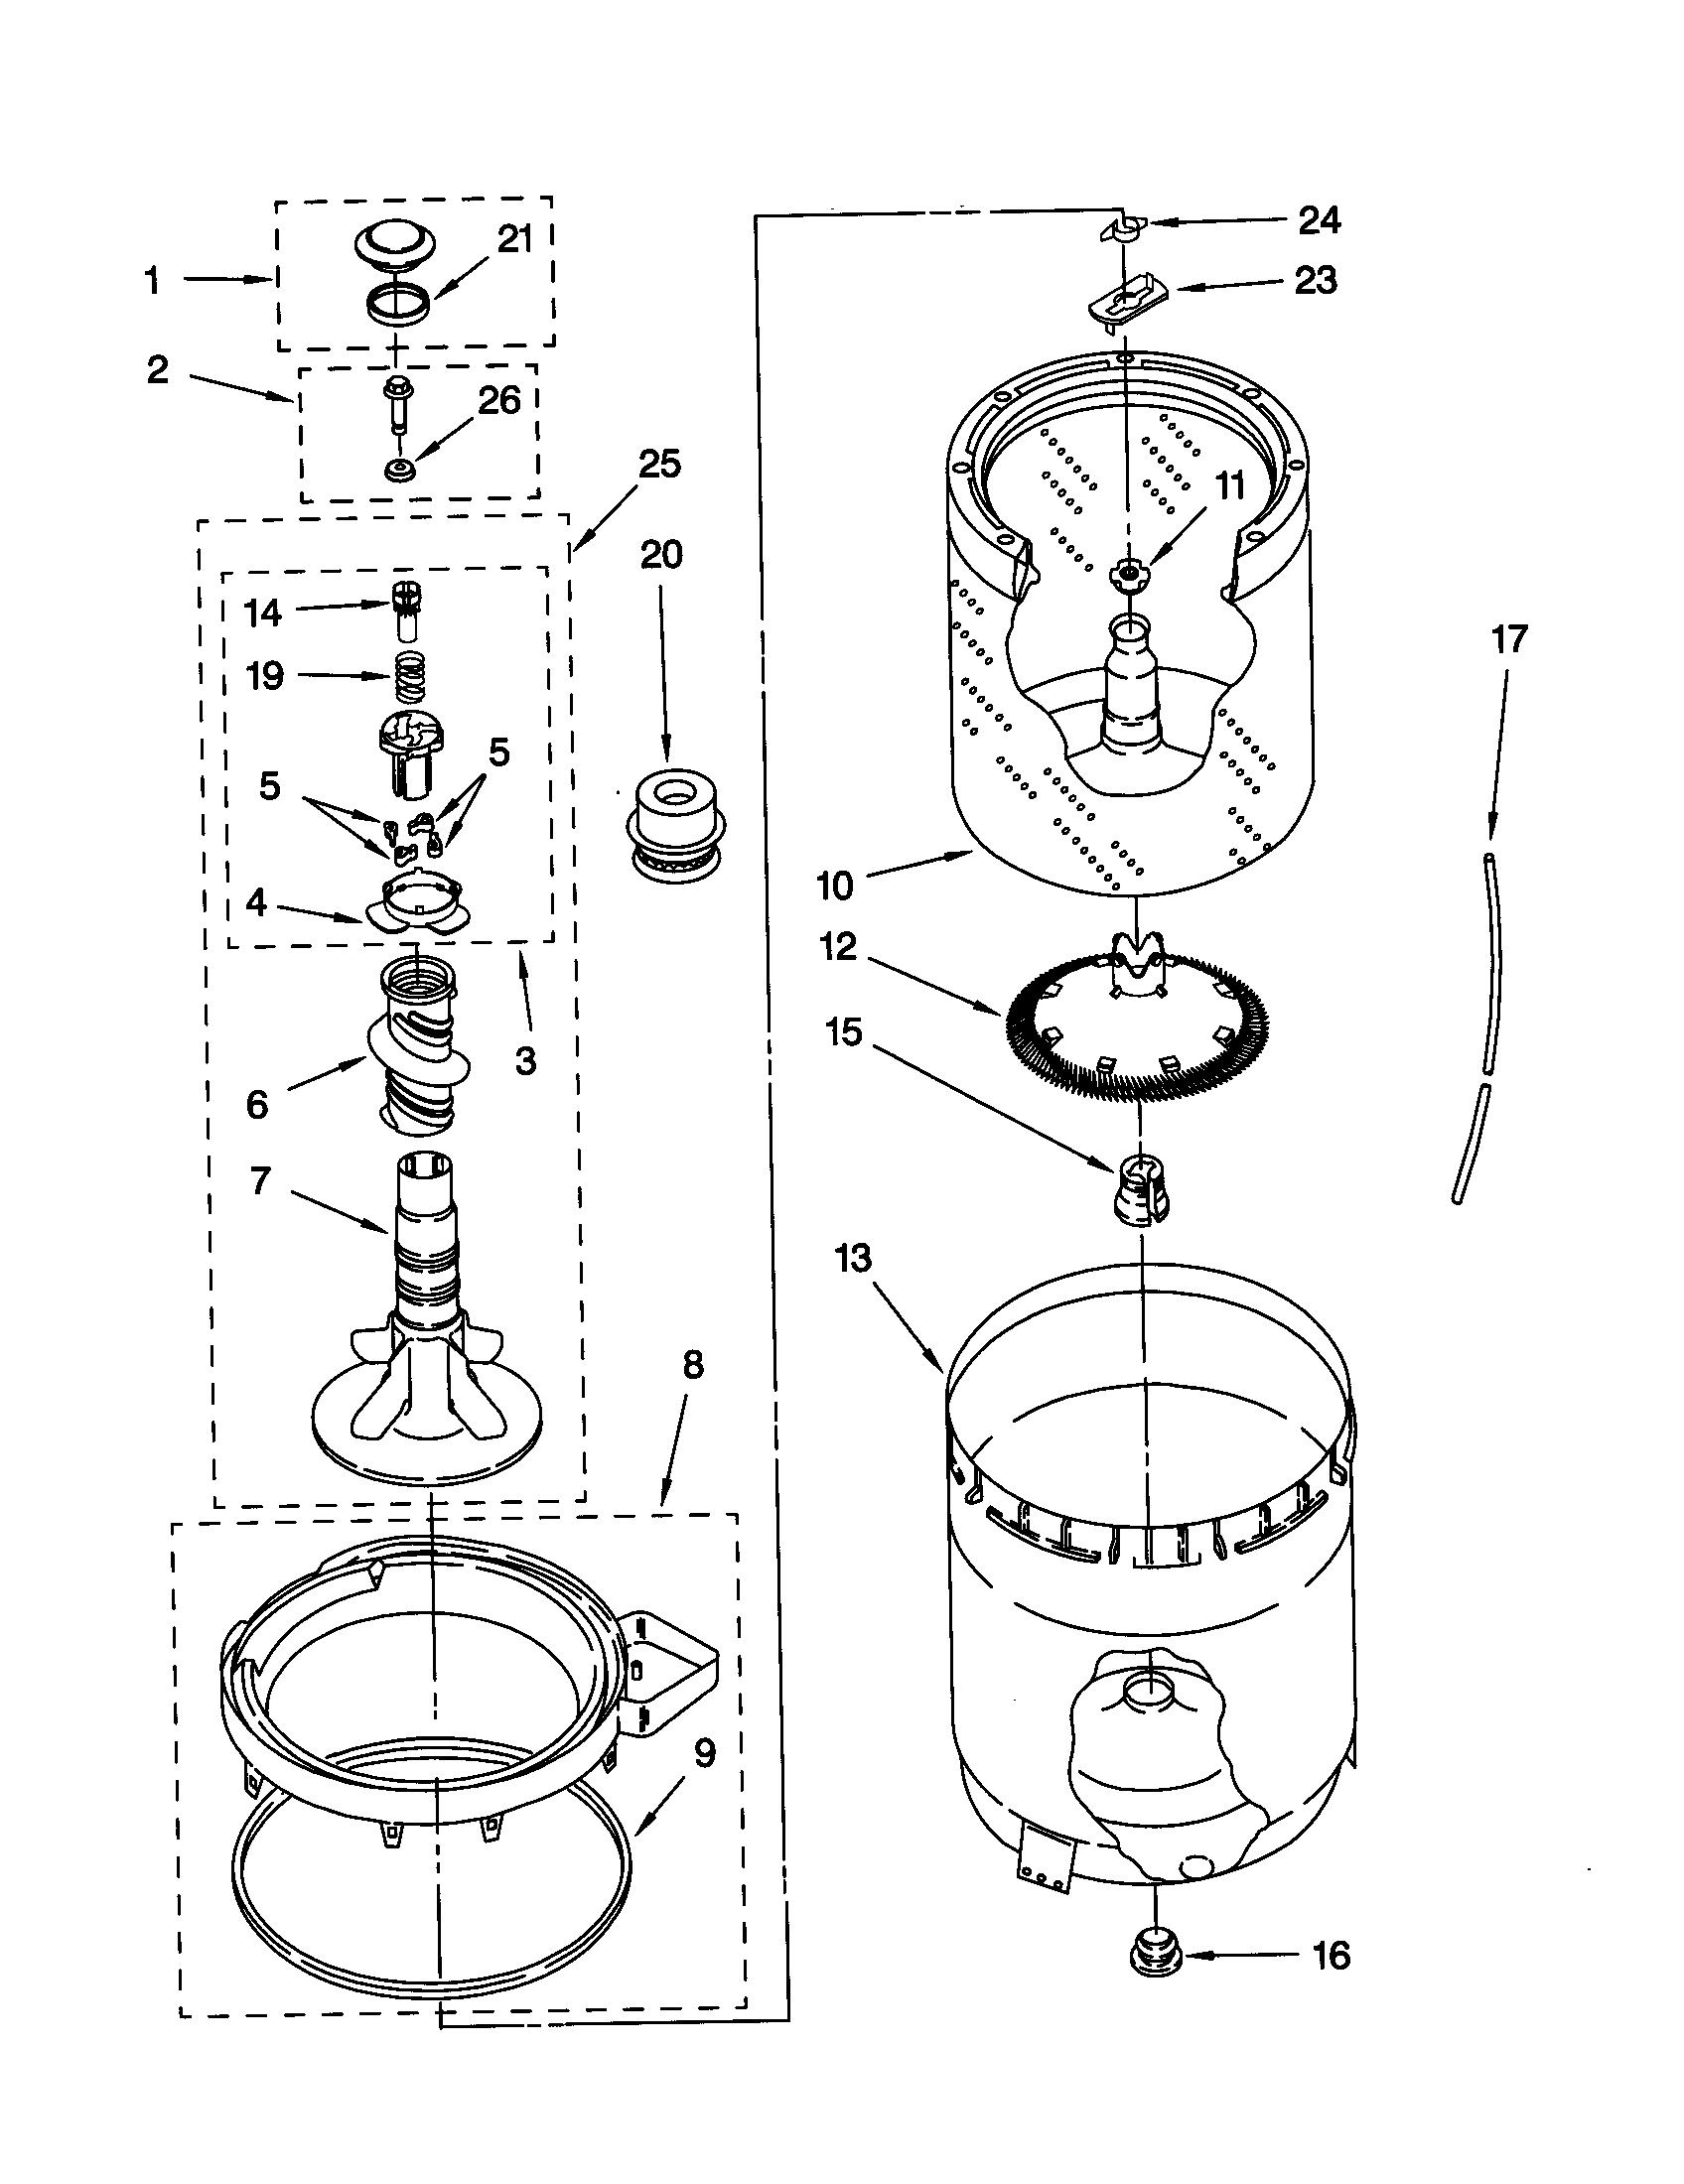 Kenmore 90 Series Washer Parts Diagram | Kenmore 70 Series Washing Machine Repair Manual 2019 Ebook Library